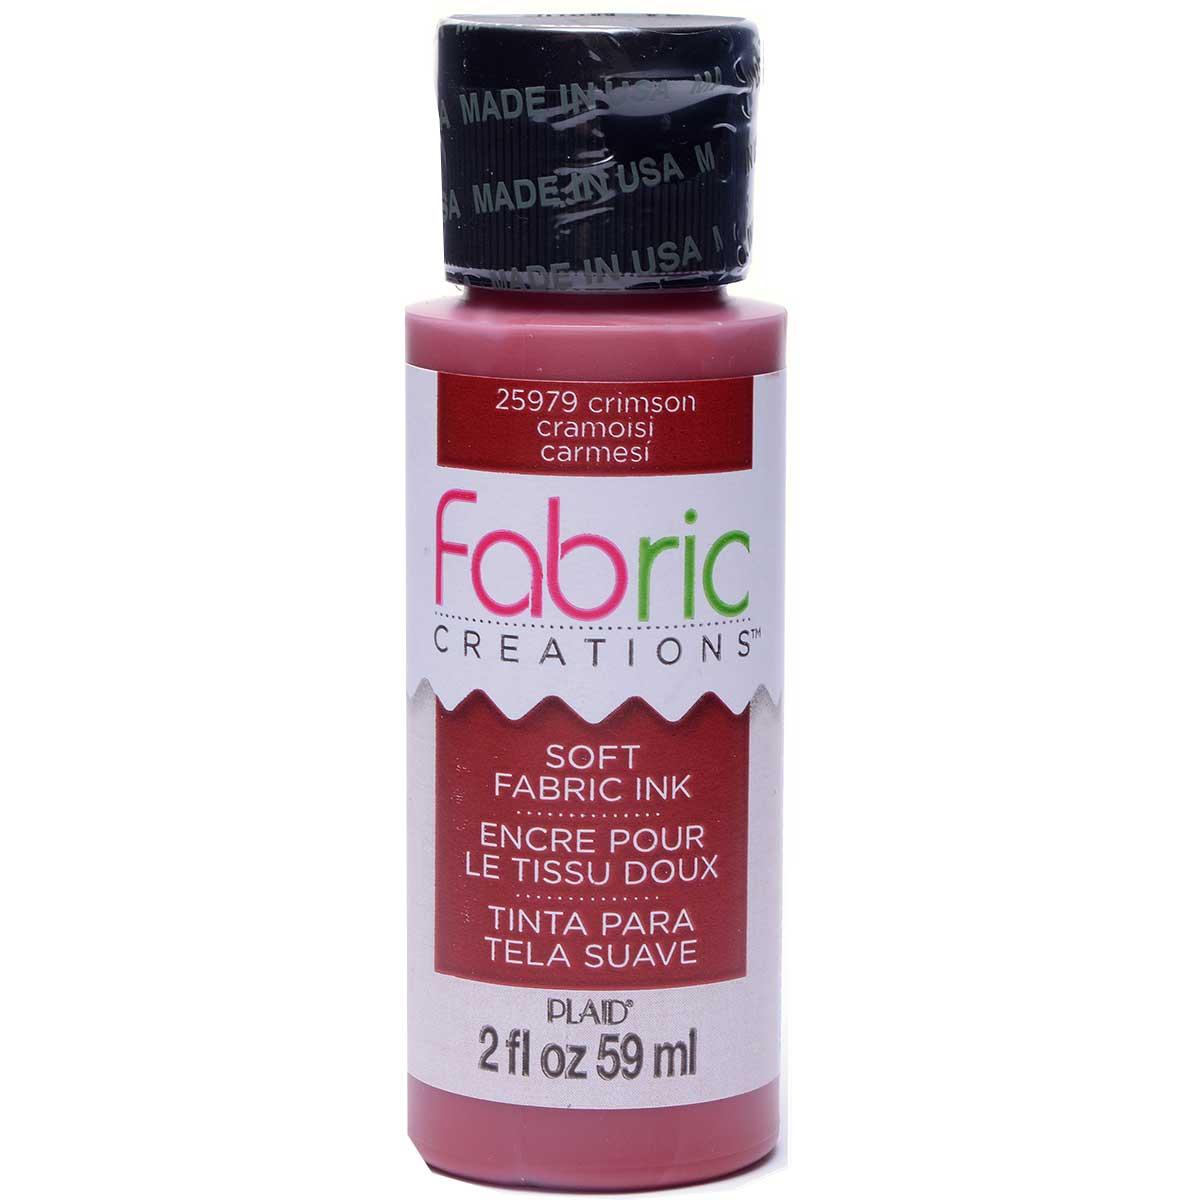 Fabric Creations™ Soft Fabric Inks - Crimson, 2 oz.